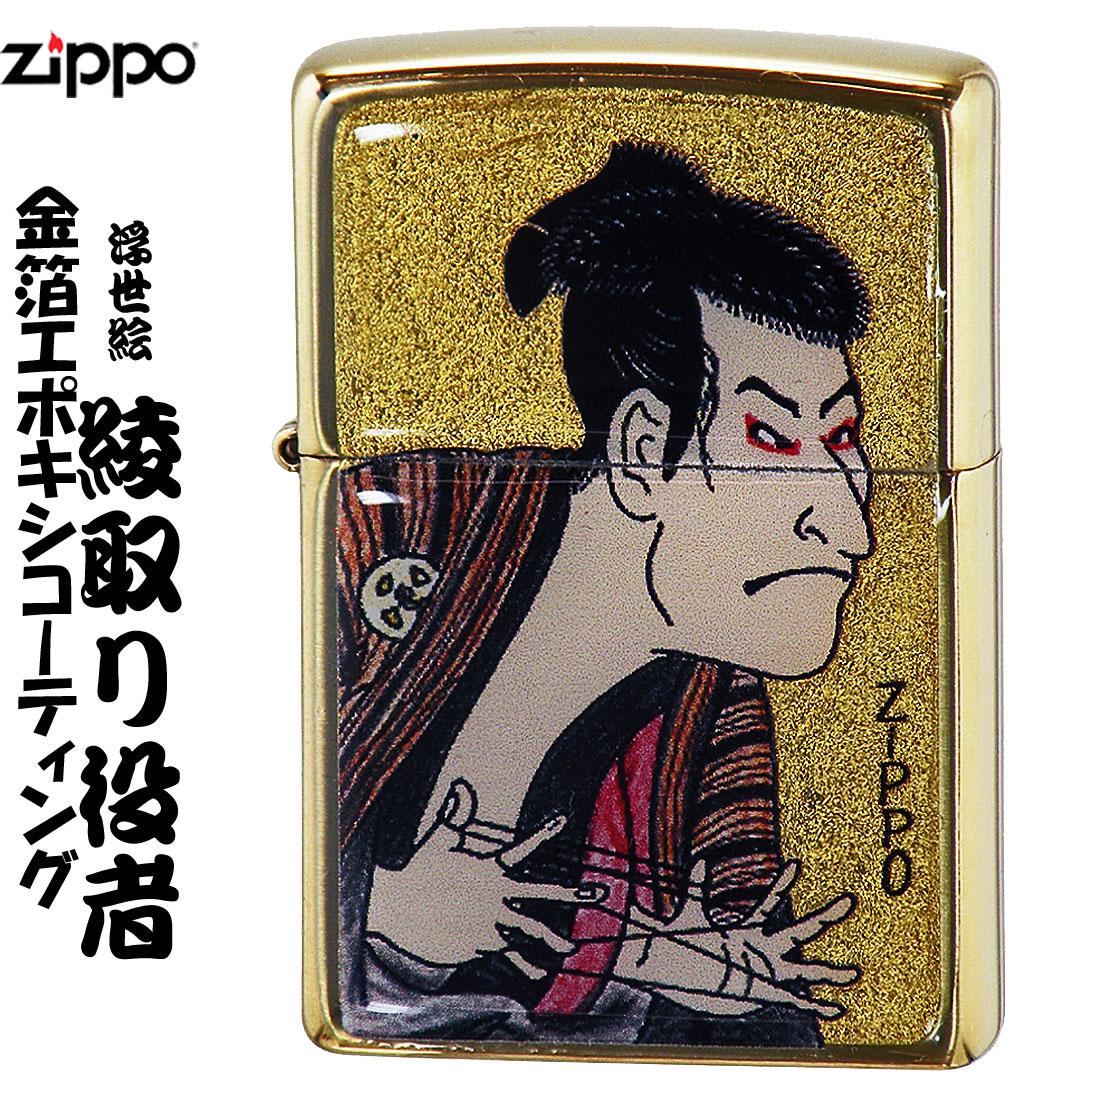 zippo(ジッポーライター) 金箔和柄綾取り役者画像